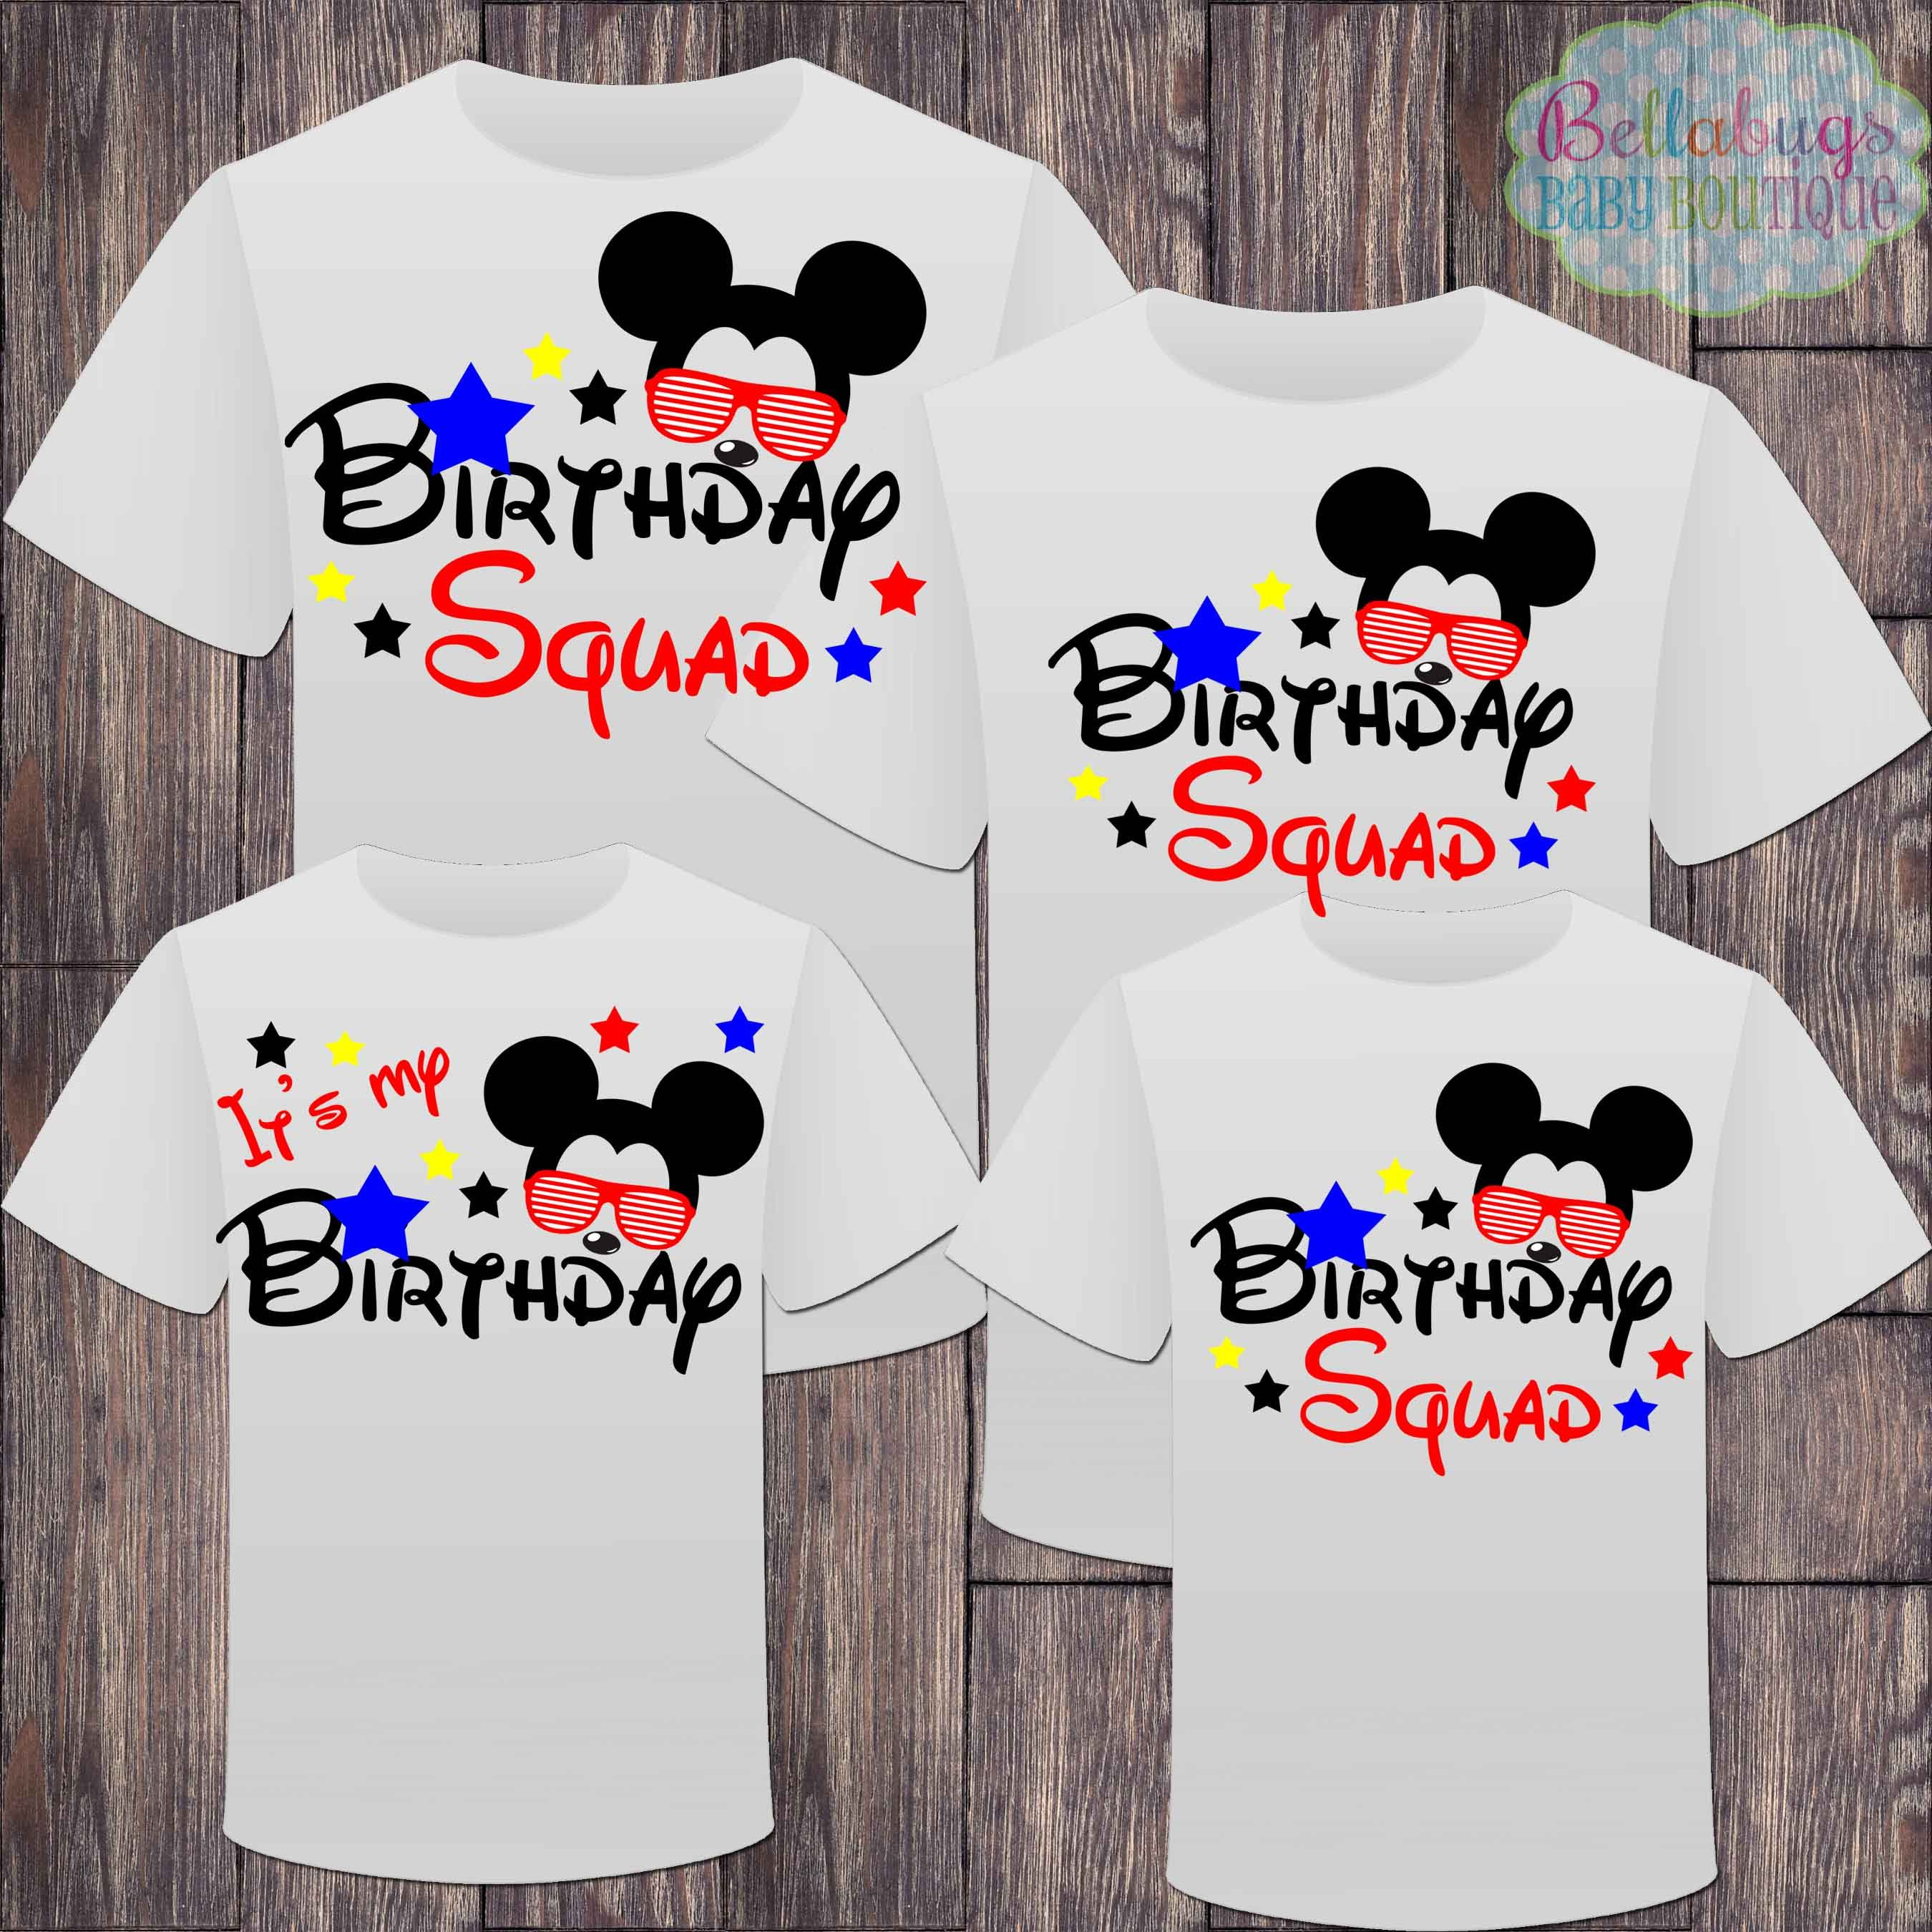 02a24b4d1831 Matching Birthday Boy It s My Birthday Tshirts - Mickey Mouse Birthday -  Birthday Squad - Matching Birthday Shirts - Sunglasses Mickey by  BellabugsBaby on ...